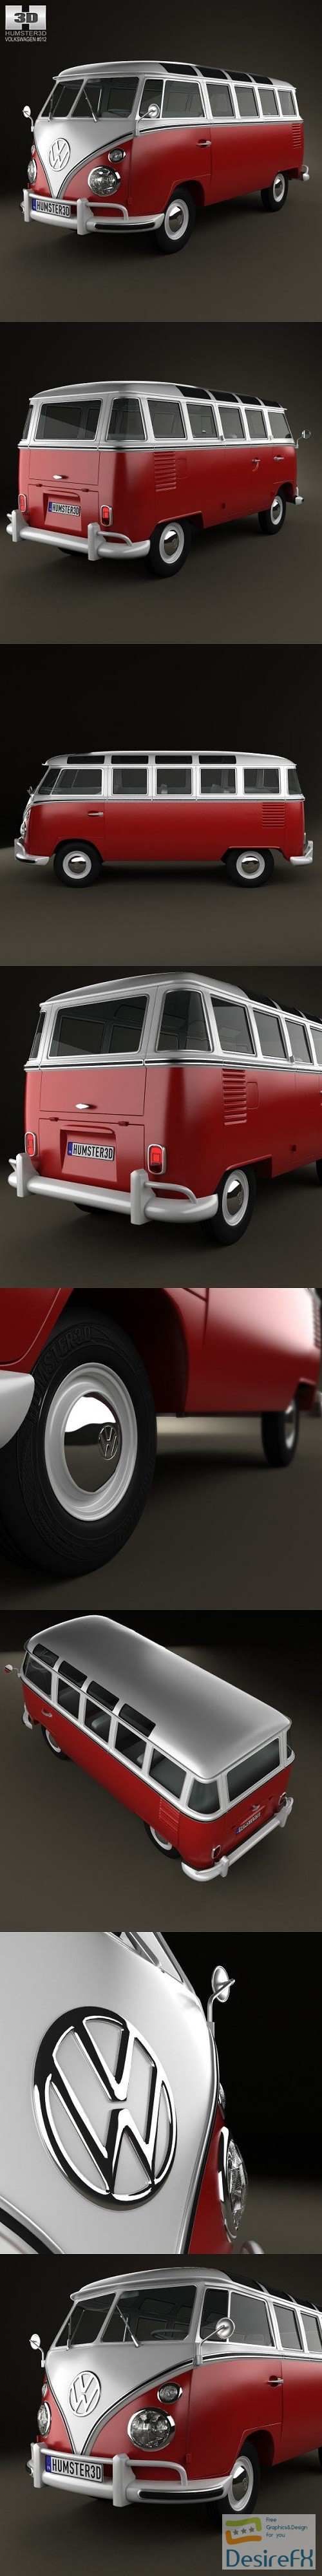 3d-models - Volkswagen Transporter T1 1950 3D Model